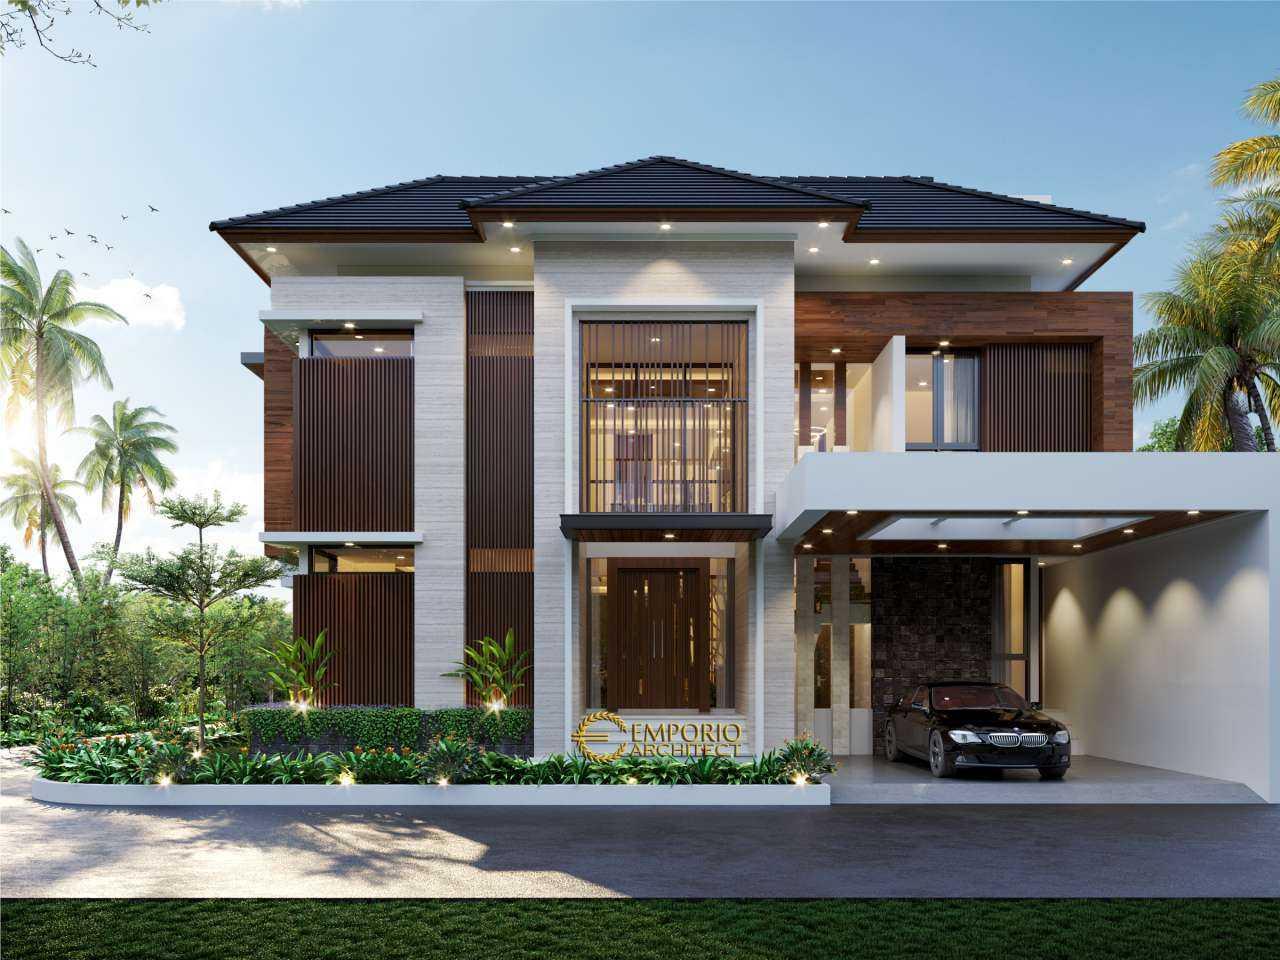 Emporio Architect Jasa Arsitek Bekasi Desain Rumah Modern 2.5 Lantai 768 @ Cibubur, Bekasi Jatimulya, Kec. Tambun Sel., Bekasi, Jawa Barat 17510, Indonesia Jatimulya, Kec. Tambun Sel., Bekasi, Jawa Barat 17510, Indonesia Emporio-Architect-Jasa-Arsitek-Bekasi-Desain-Rumah-Modern-25-Lantai-768-Cibubur-Bekasi Modern  94418